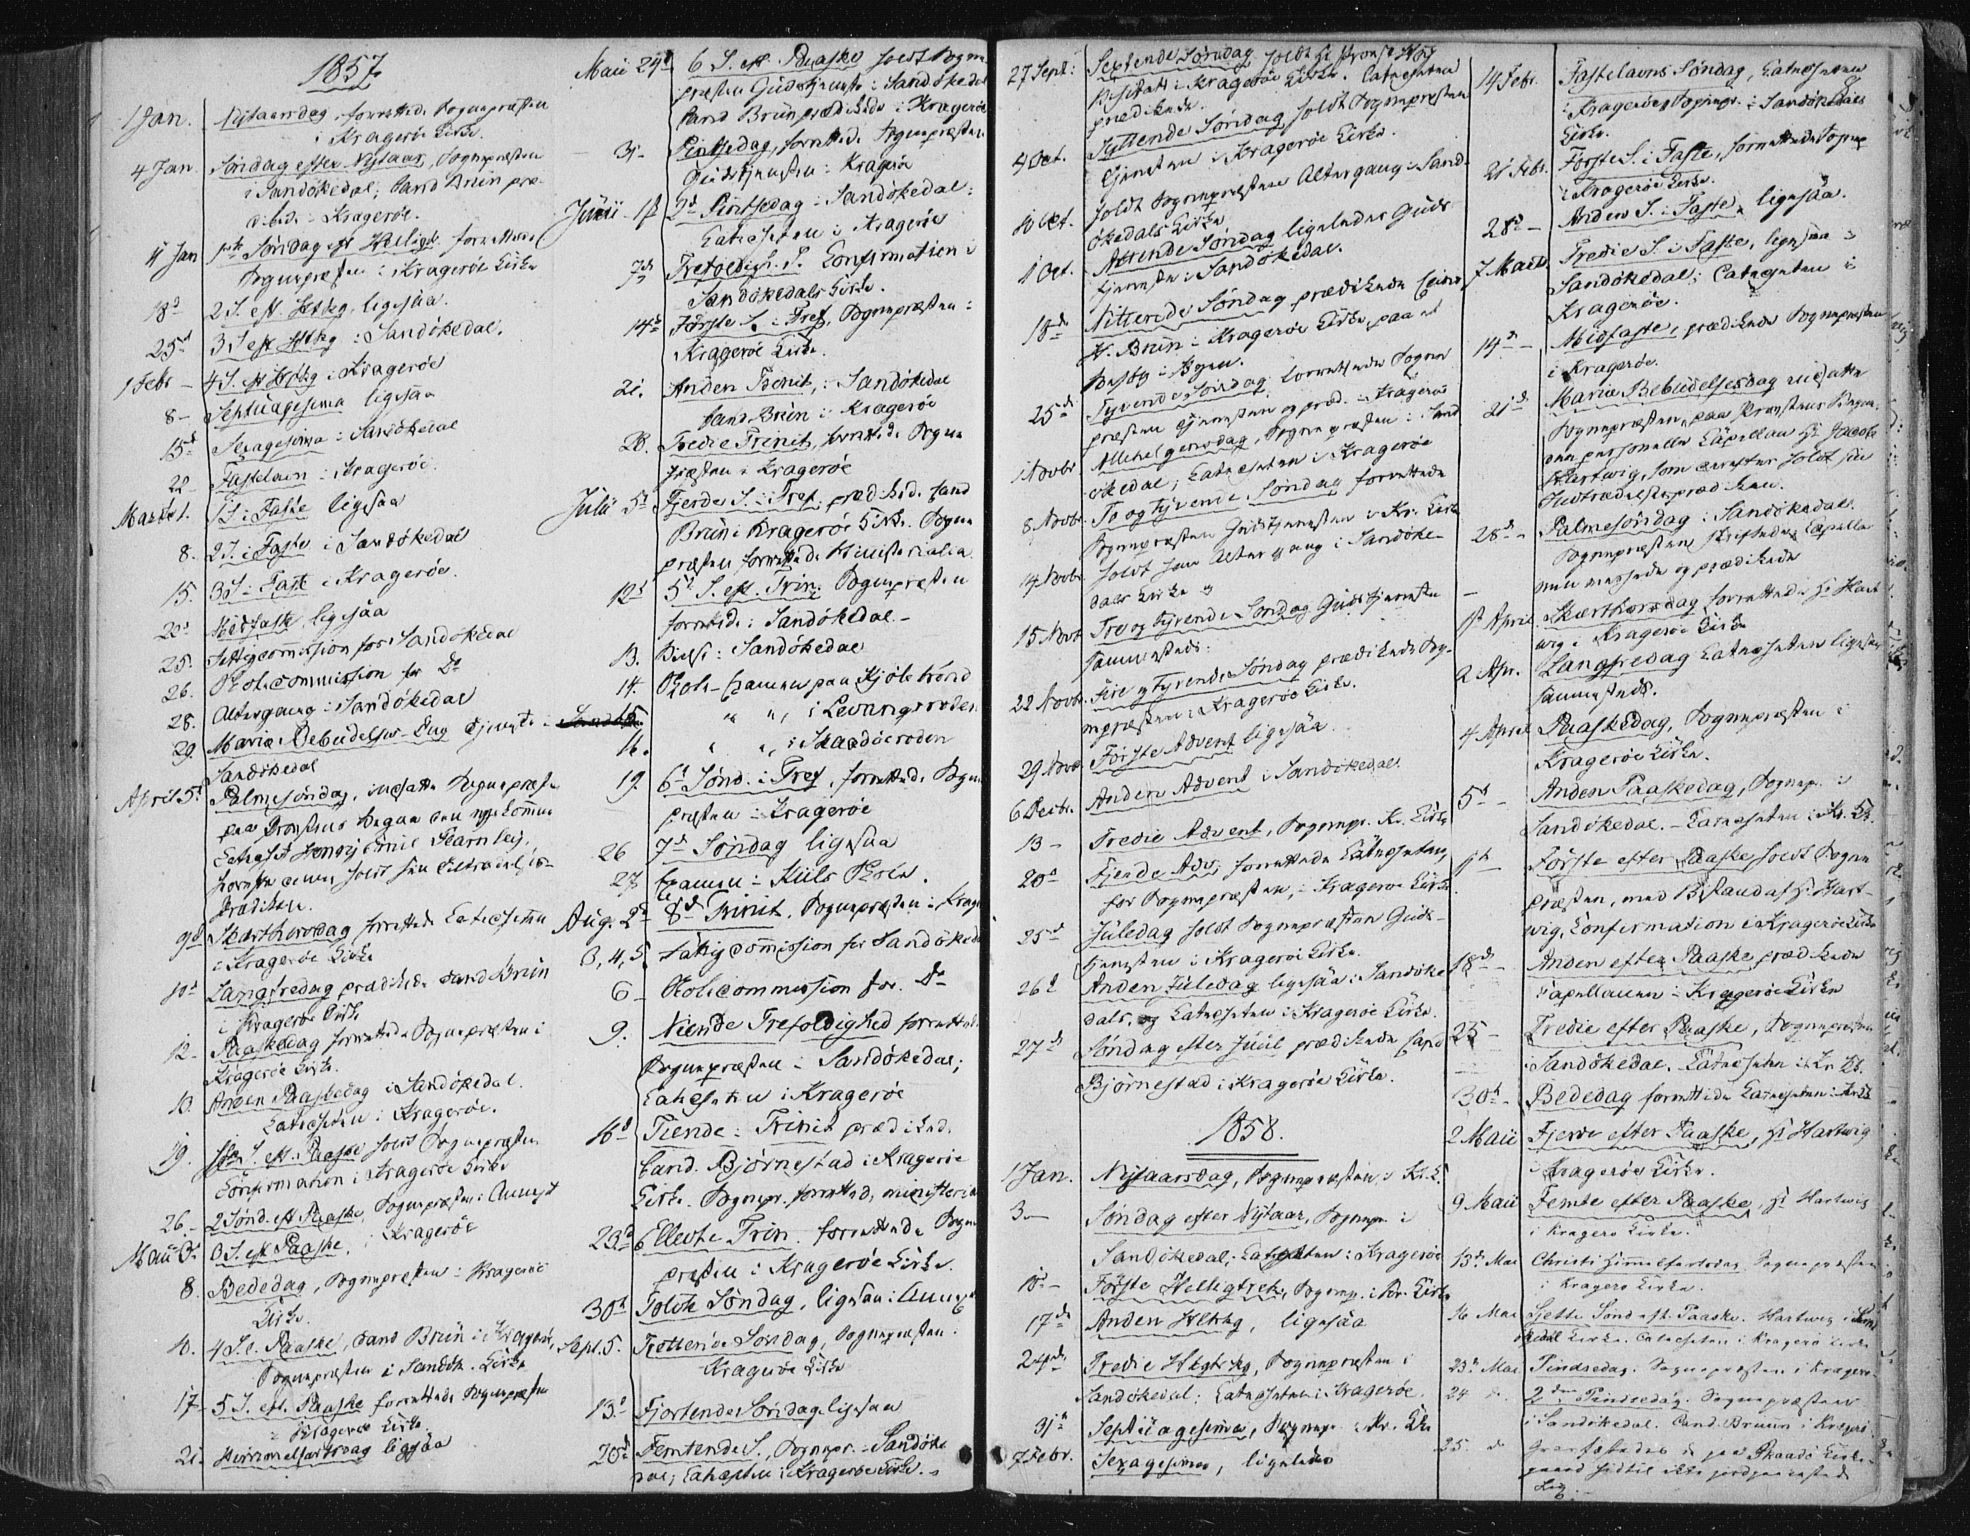 SAKO, Kragerø kirkebøker, F/Fa/L0006: Ministerialbok nr. 6, 1847-1861, s. 8